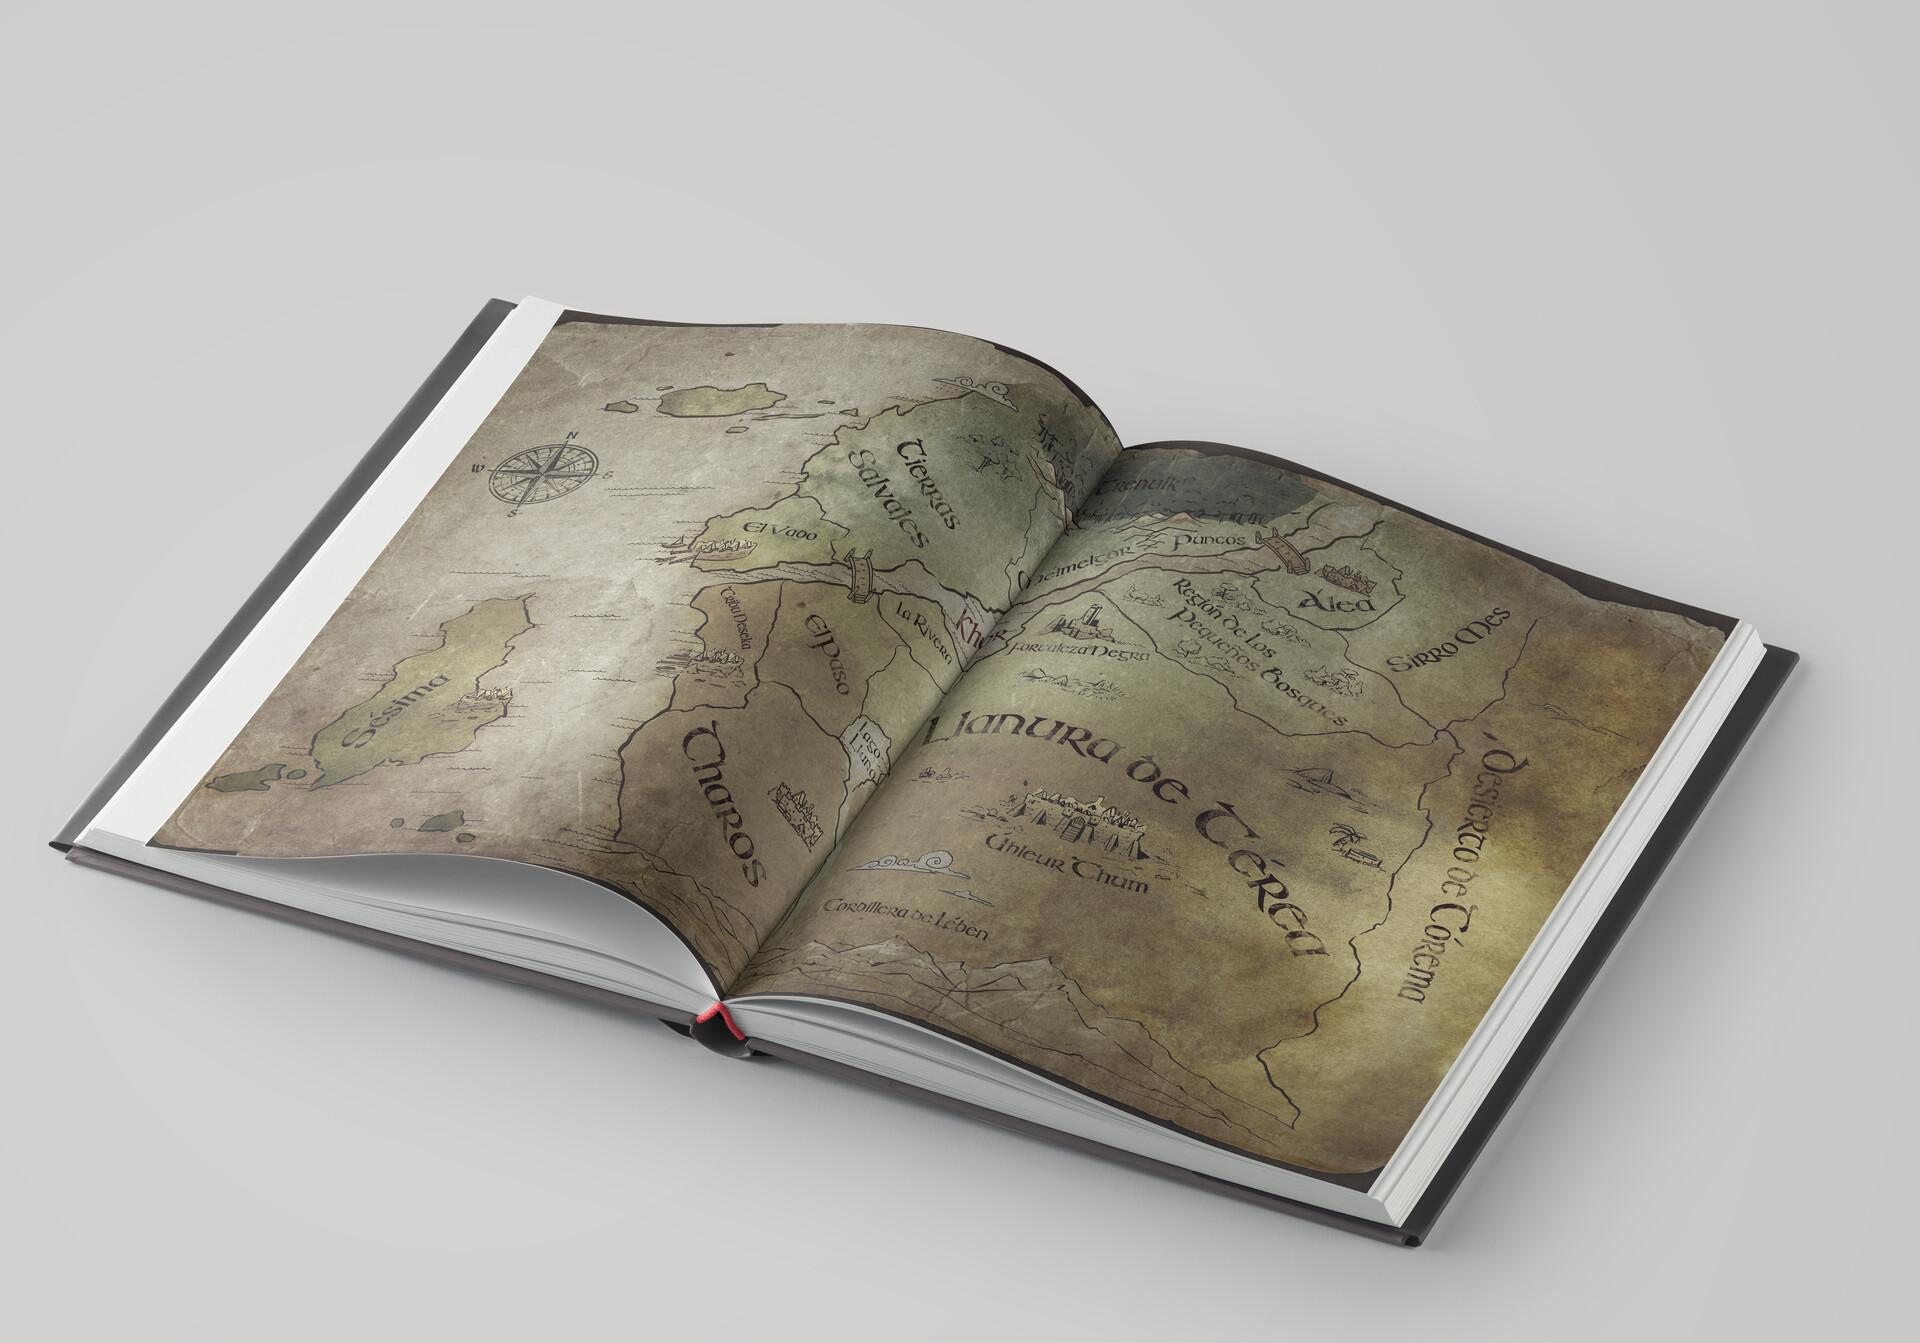 Yeve drovossekova hard cover open book mockup